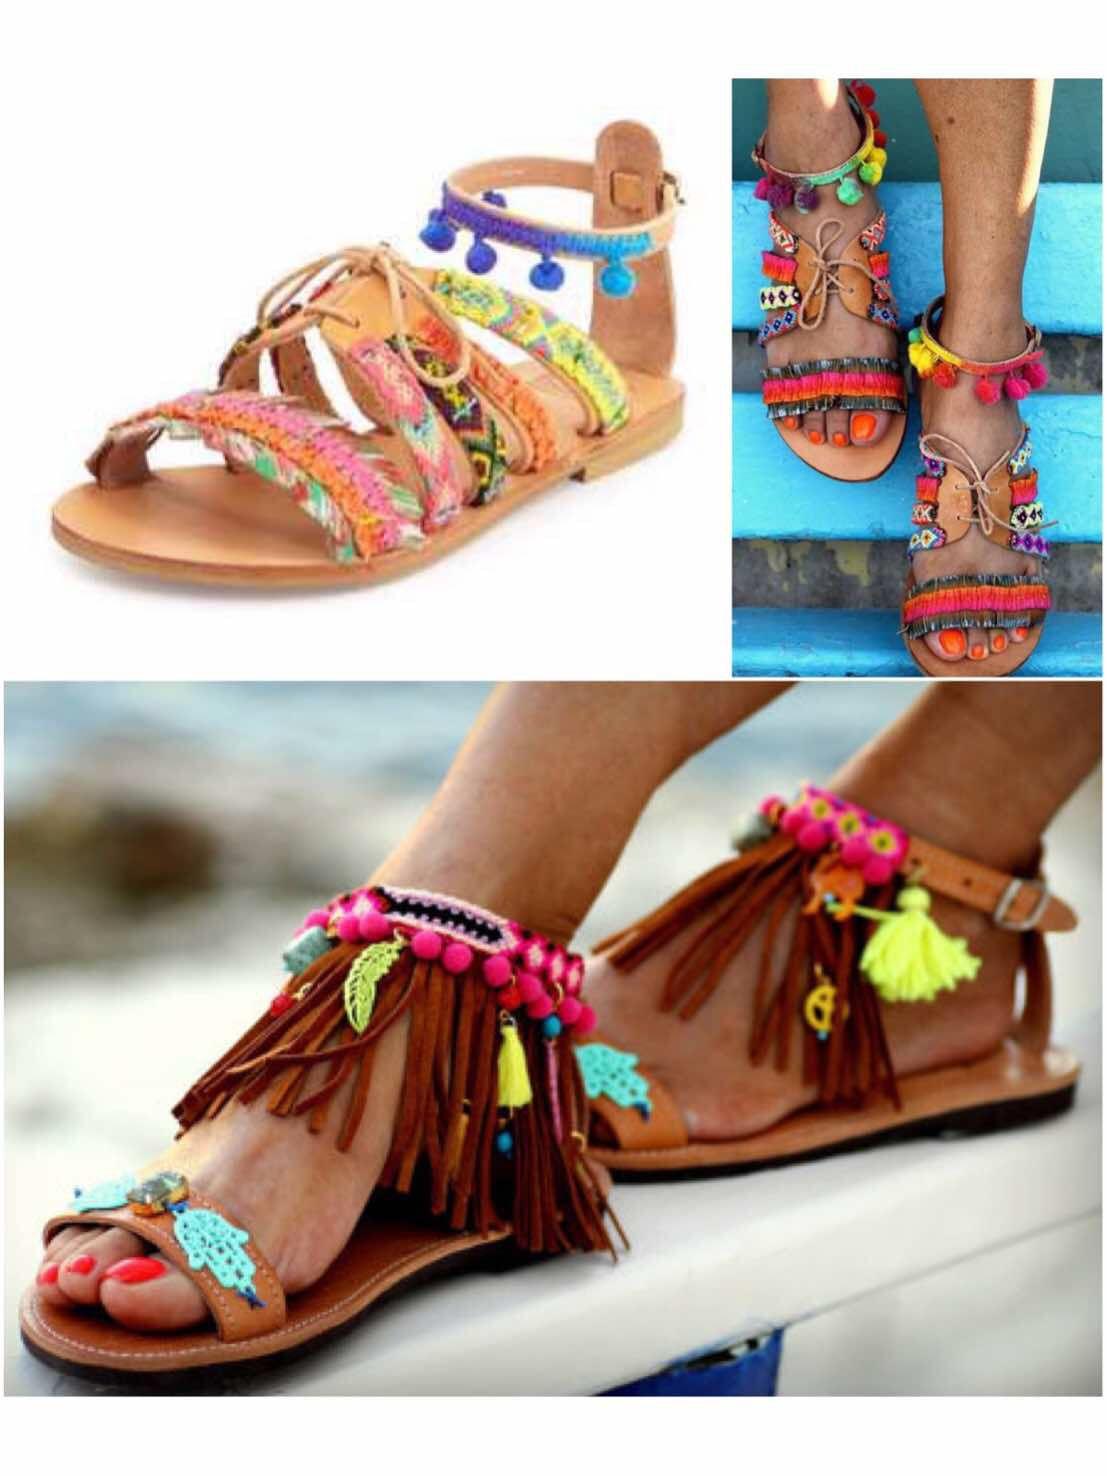 Chaussures - Sandales Post Orteils Elina Linardaki L0OXu0